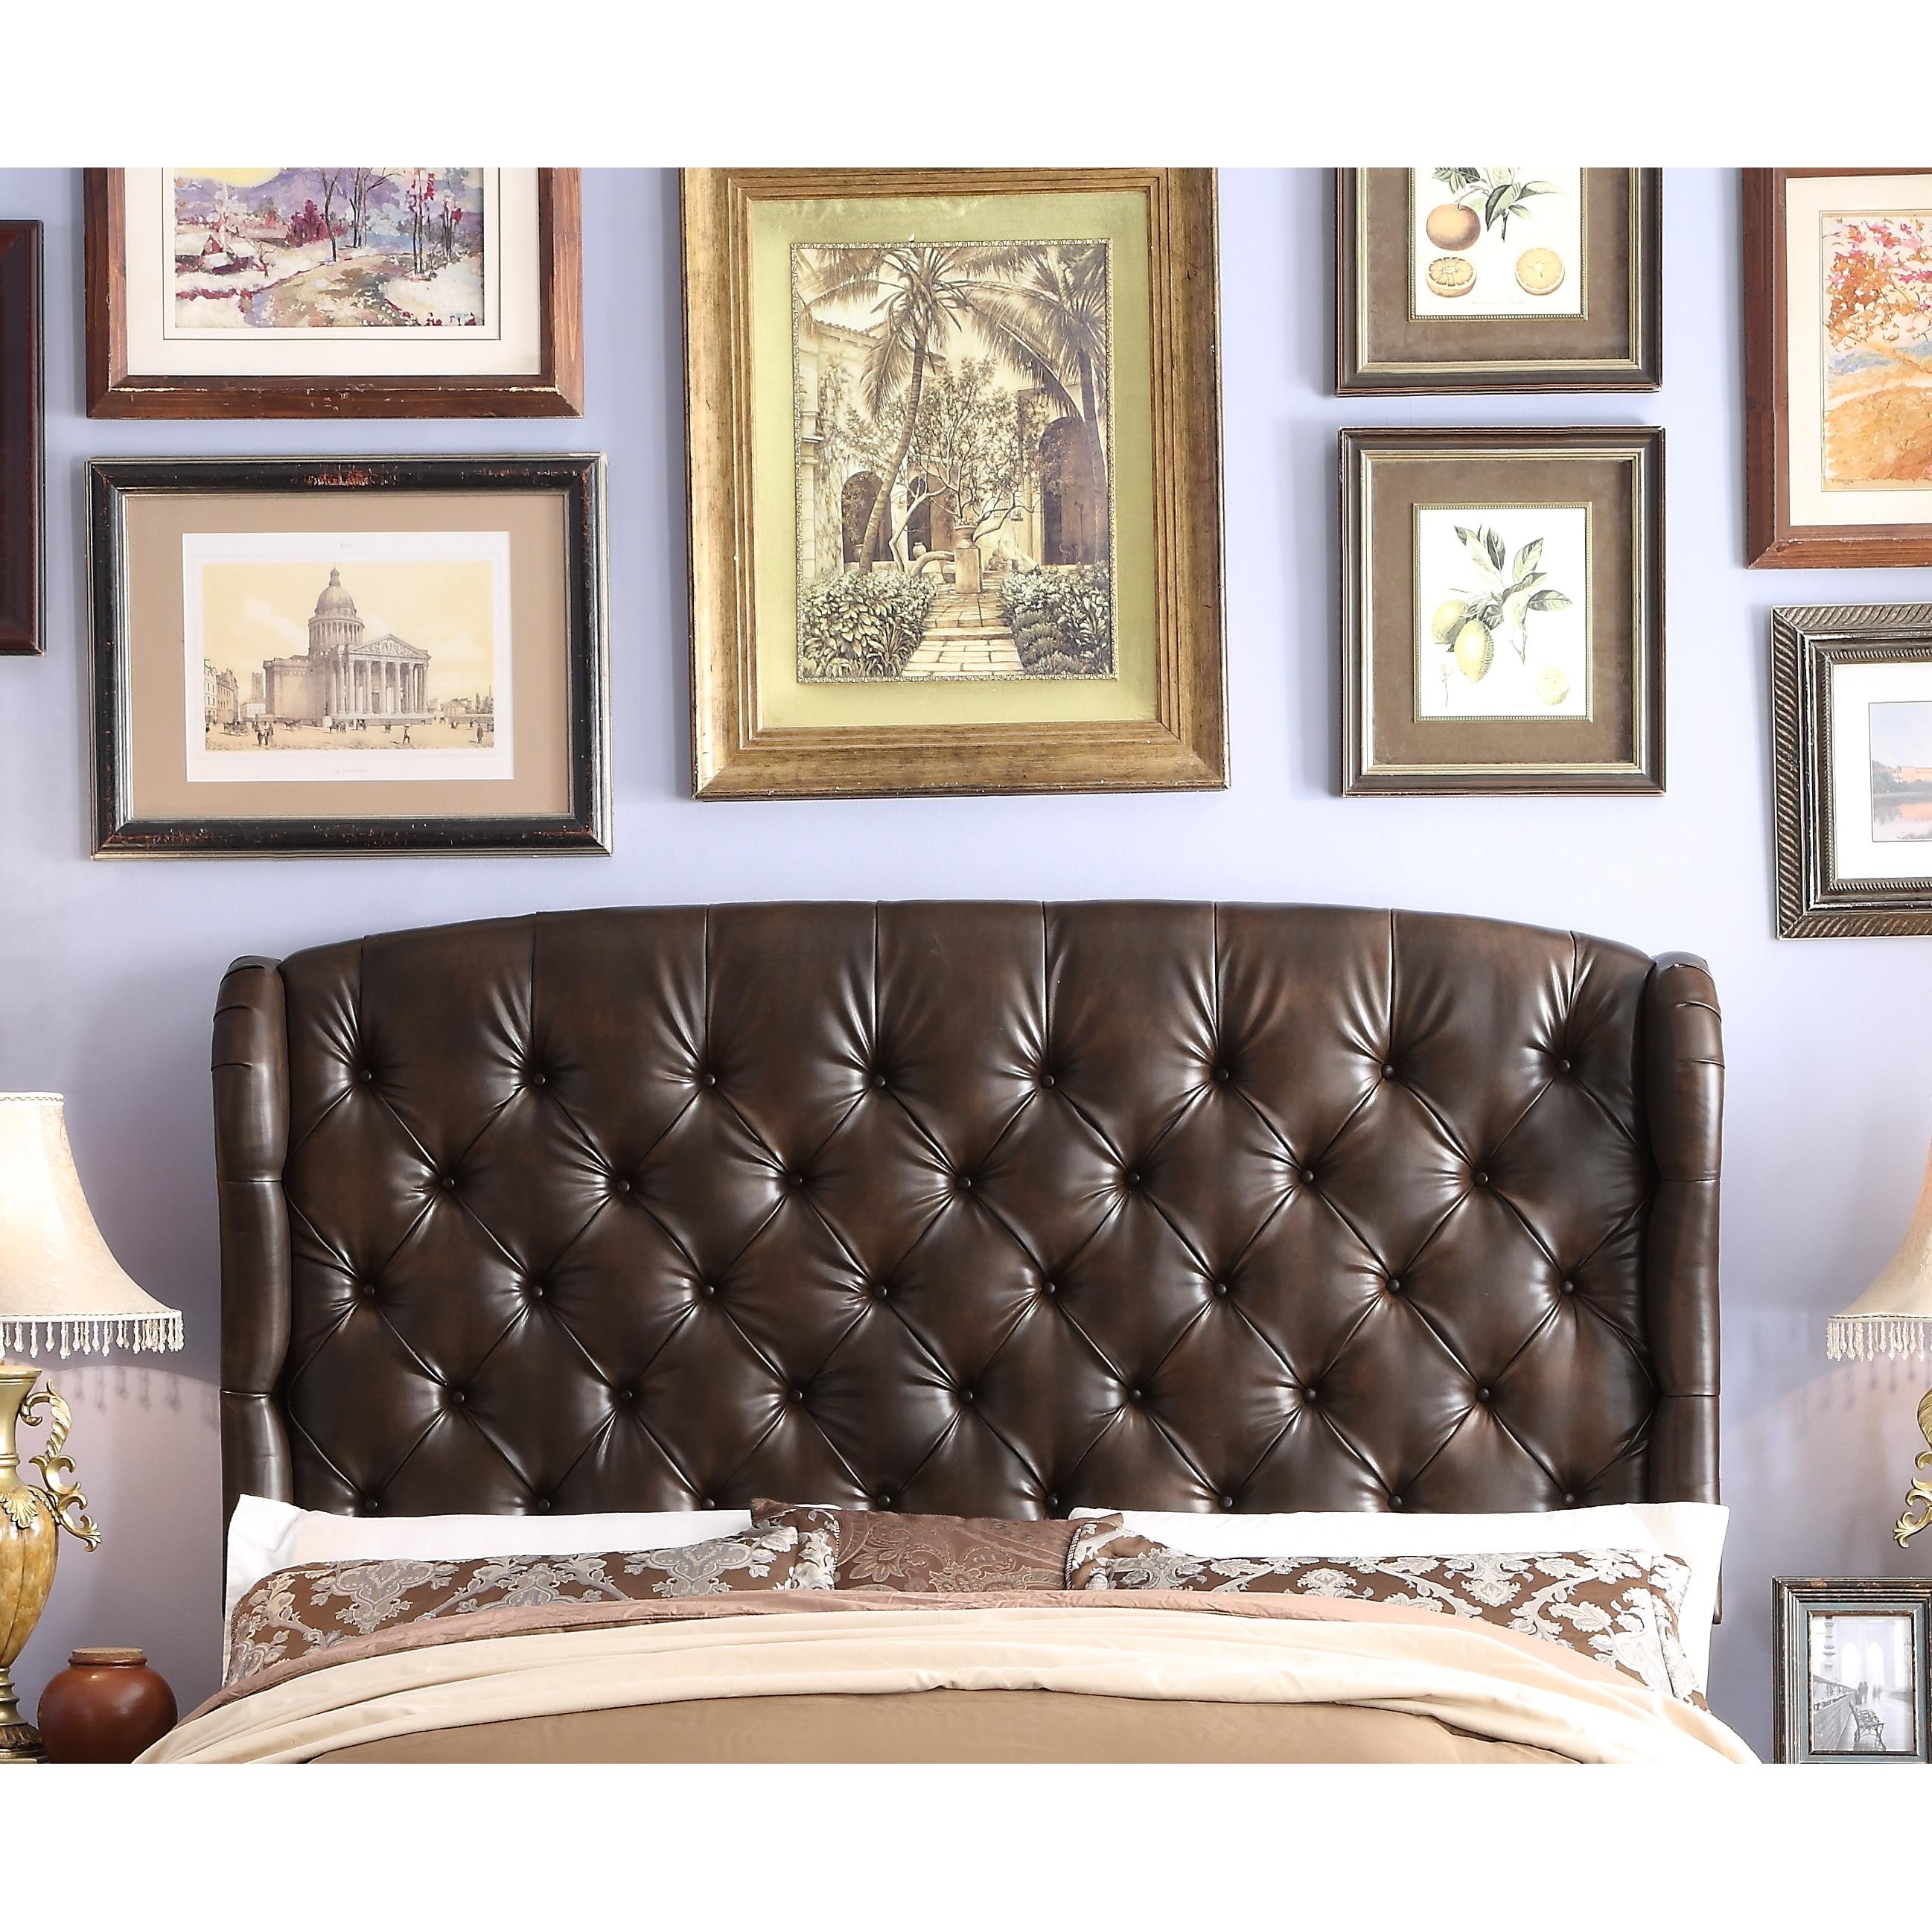 LTD Moser Bay Furniture Feliciti Espresso Queen Size Wing...